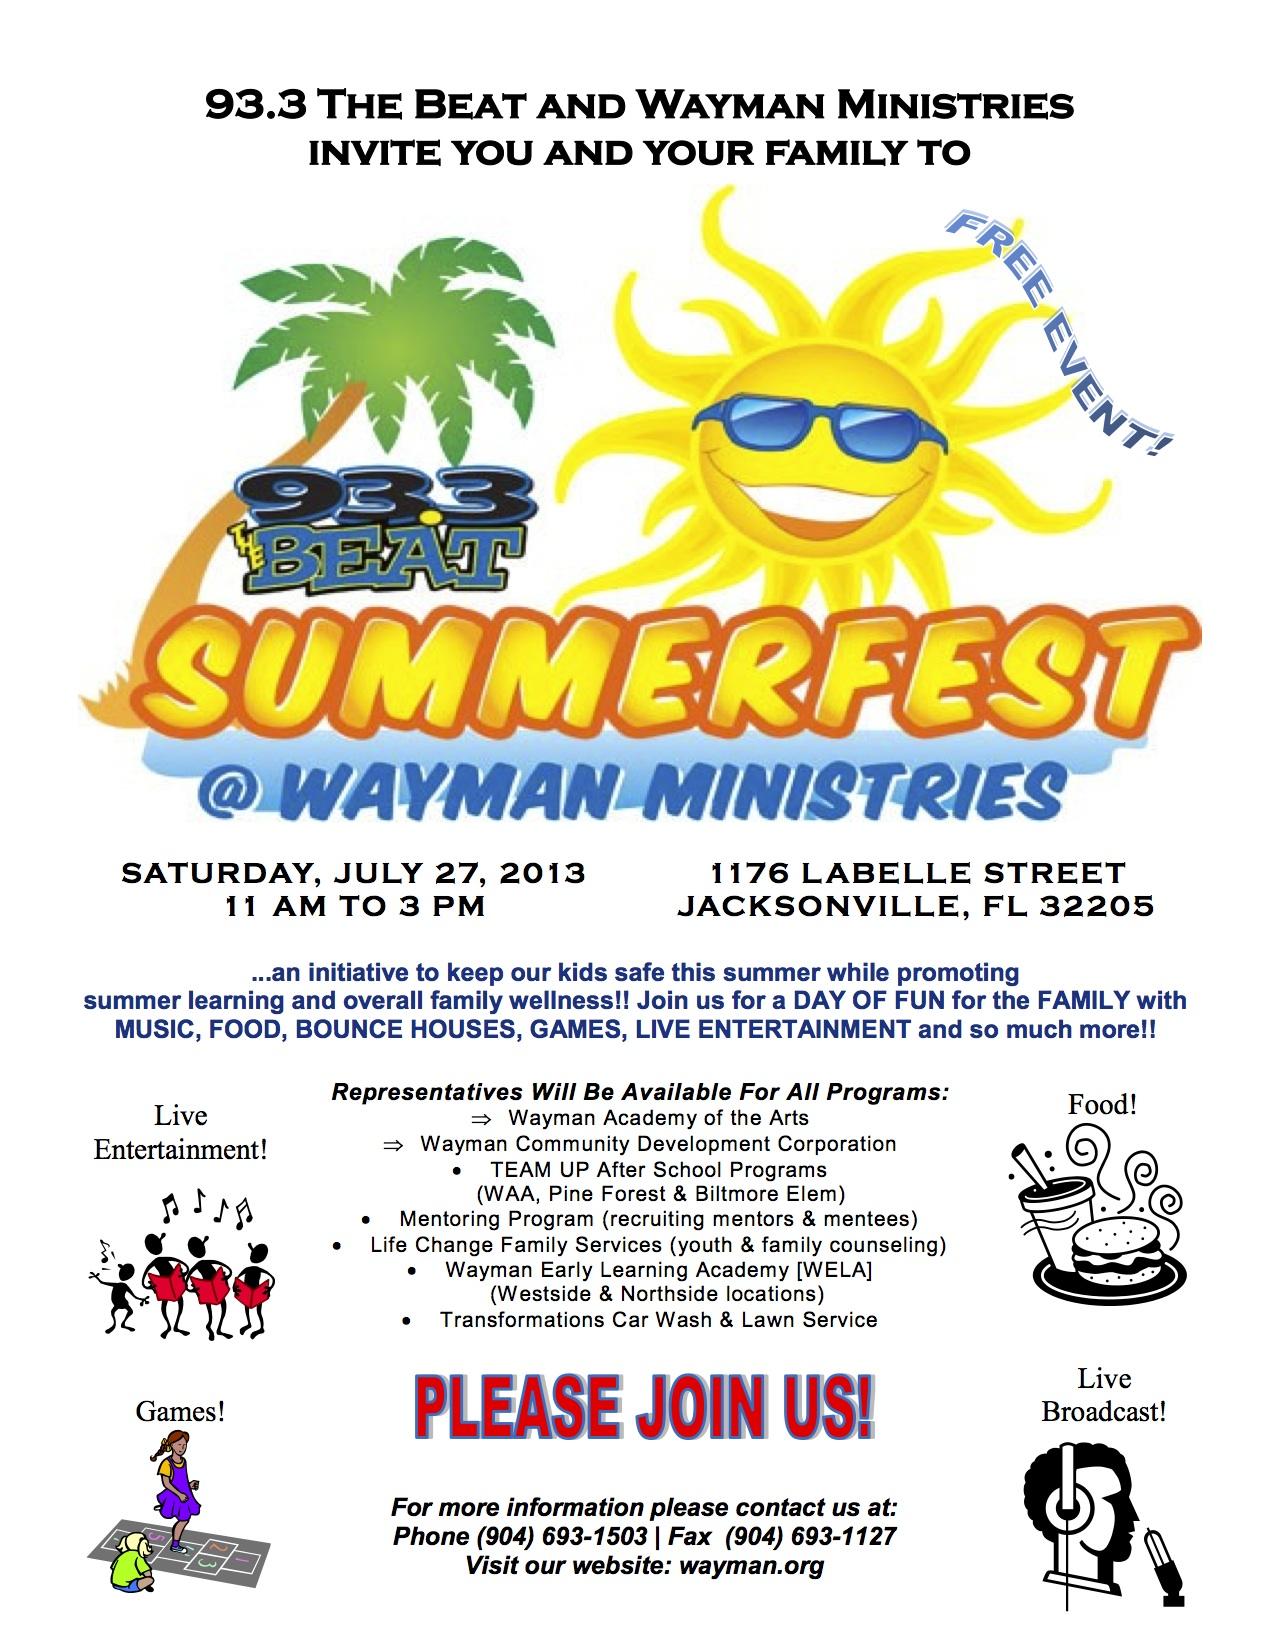 wayman-summer-fest_07272013_revd